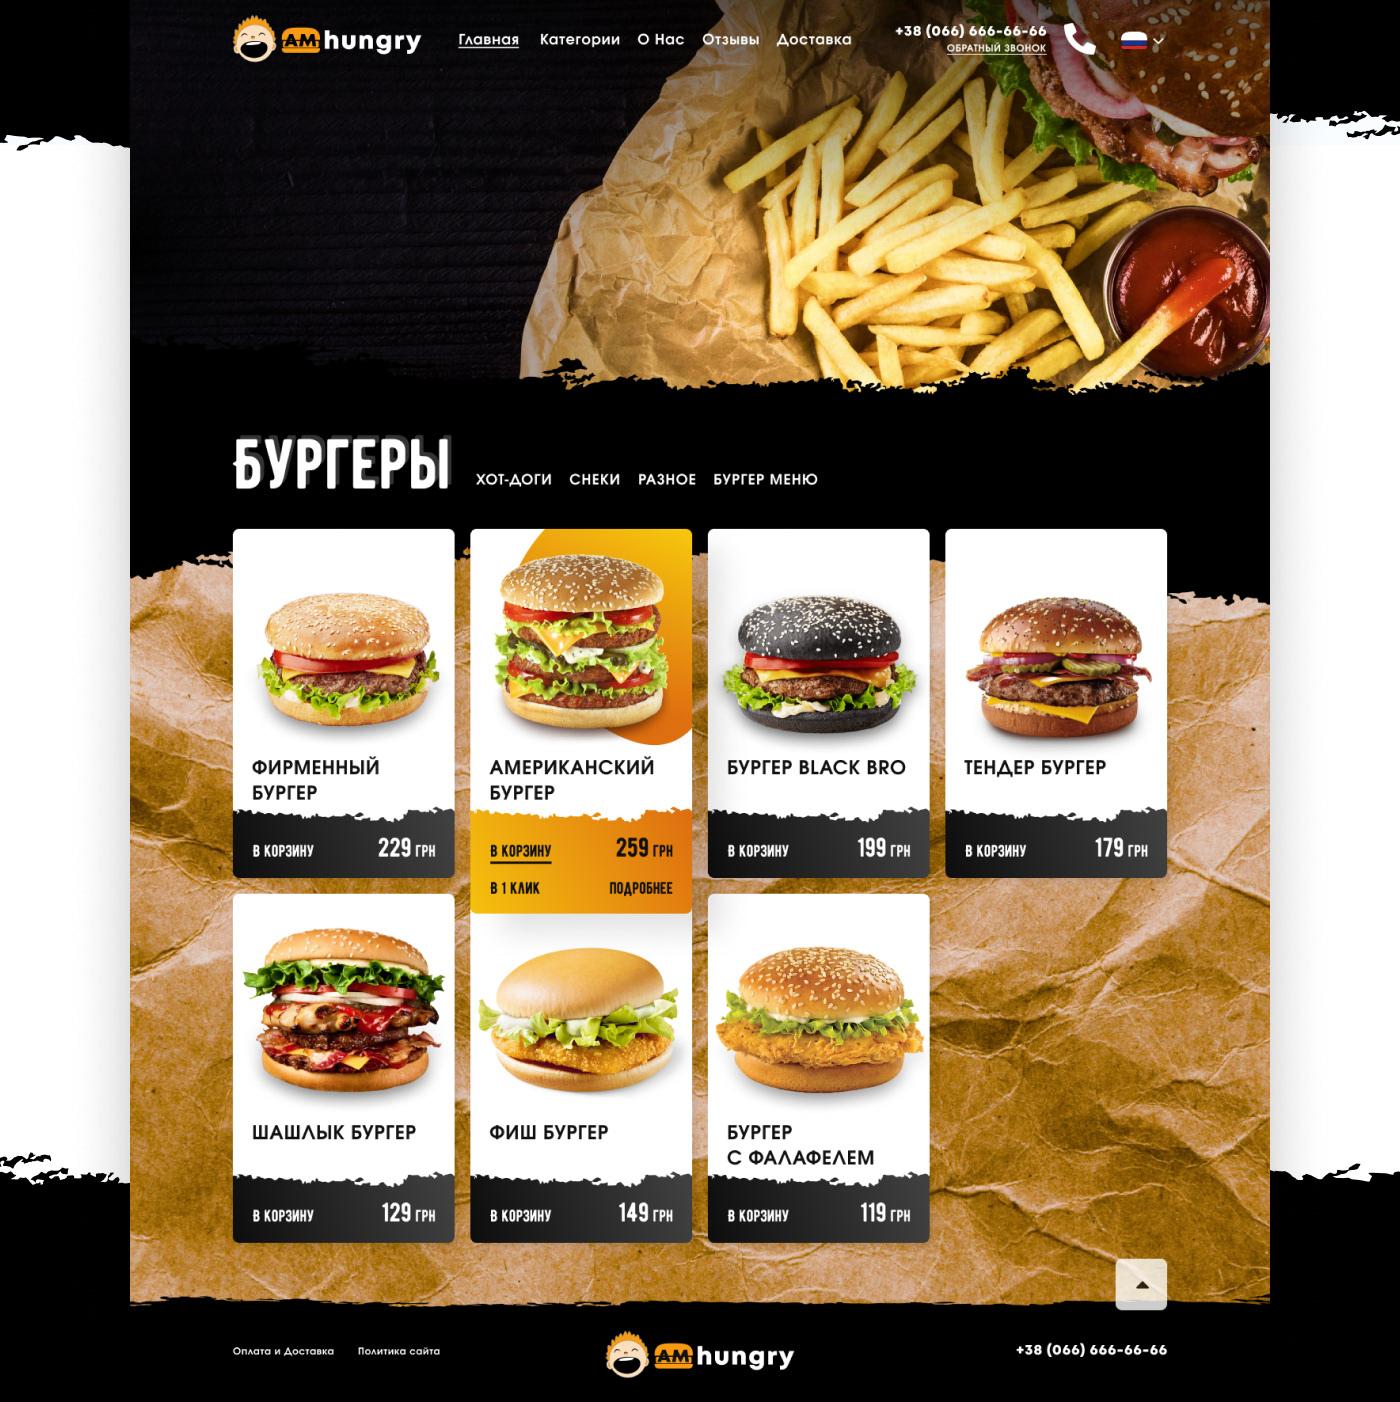 Image may contain: fast food, food and dish